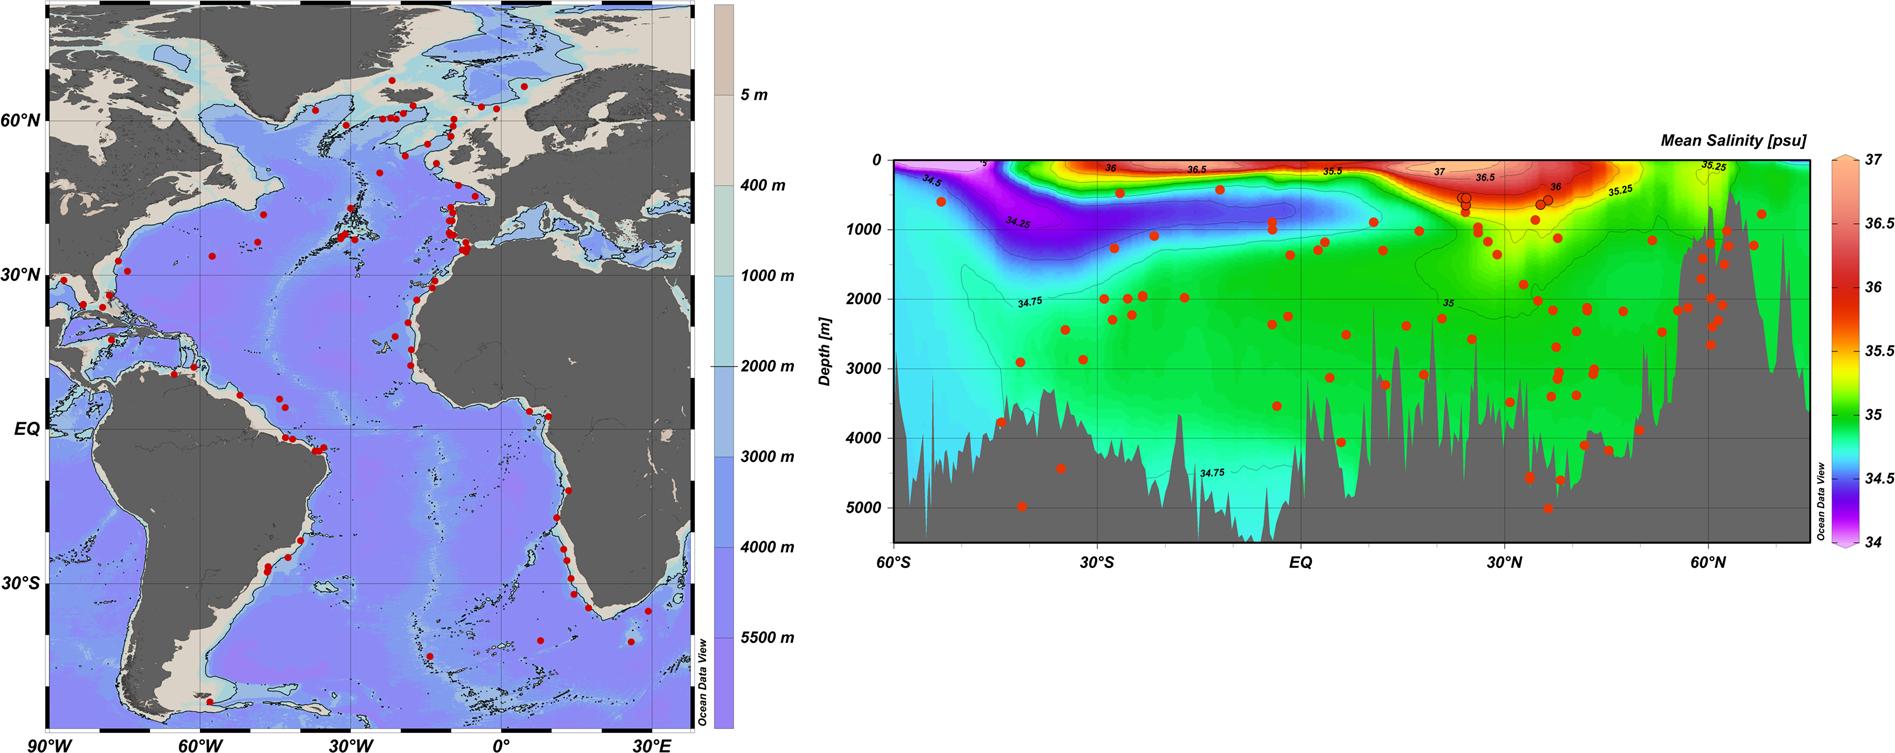 Radiocarbon dating Marina sediment